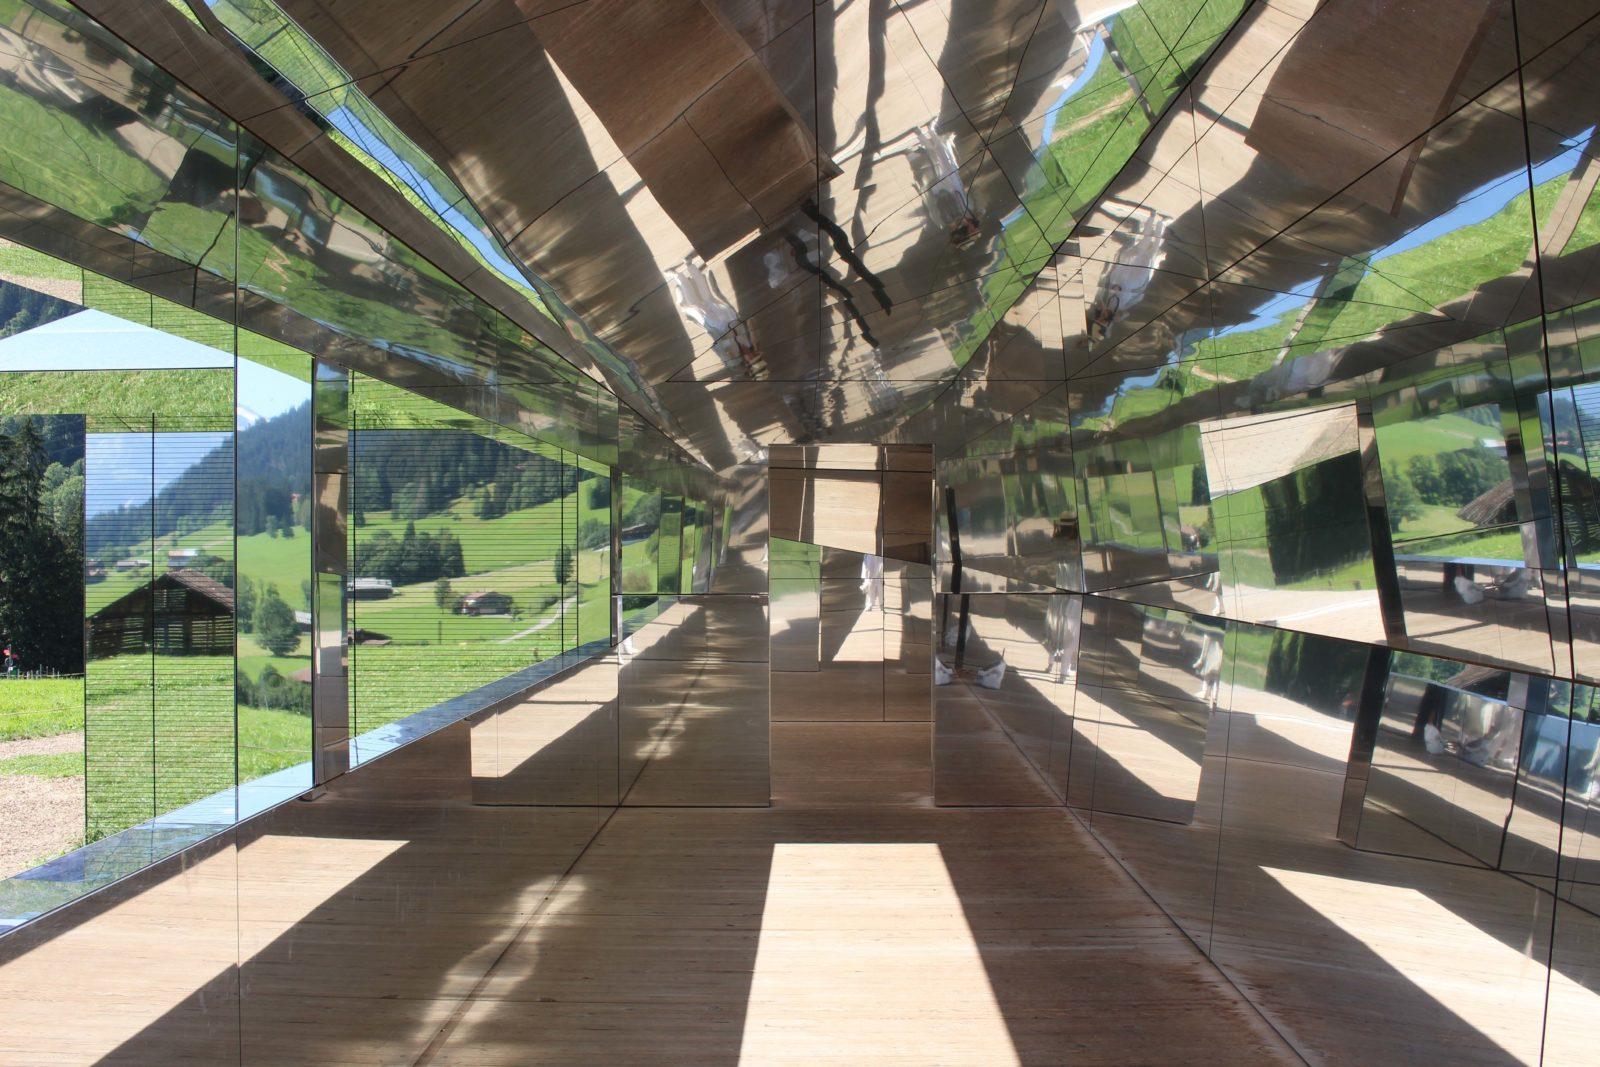 Mirage Gstaad vue de l'intérieur